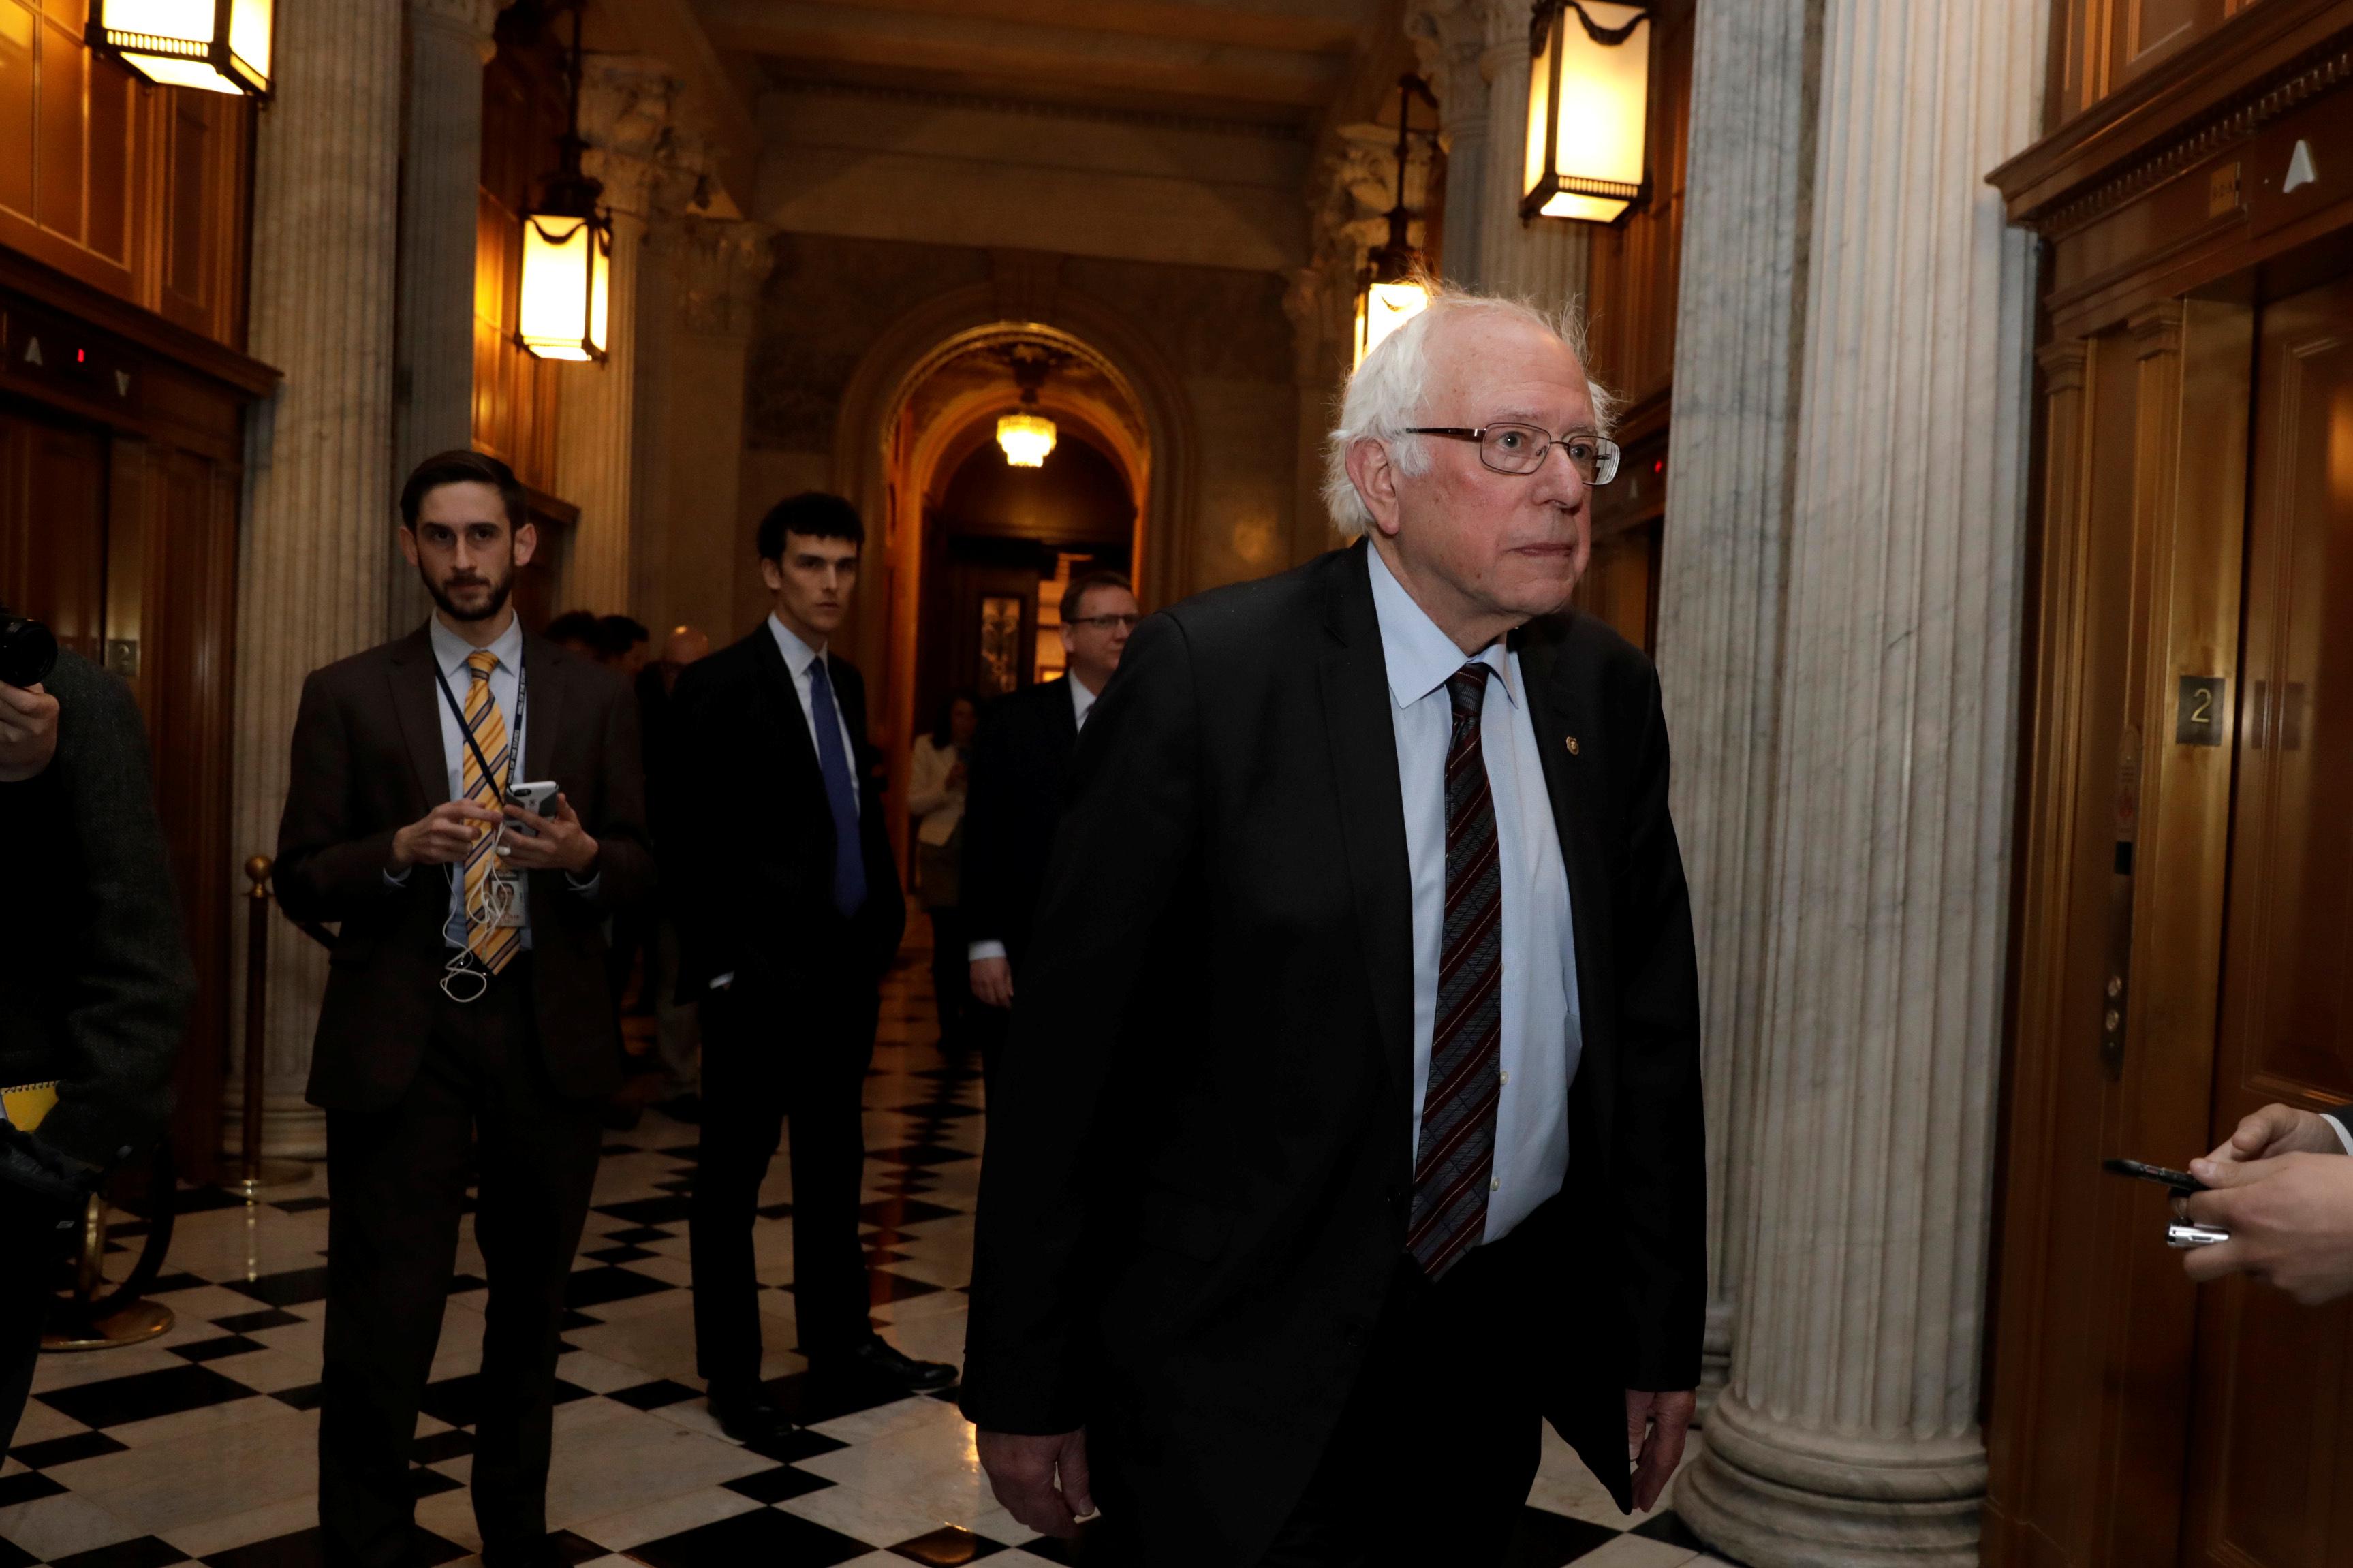 Senator Bernie Sanders arrives at Democratic Party caucus meeting in Washington, D.C. on Jan. 19, 2018.